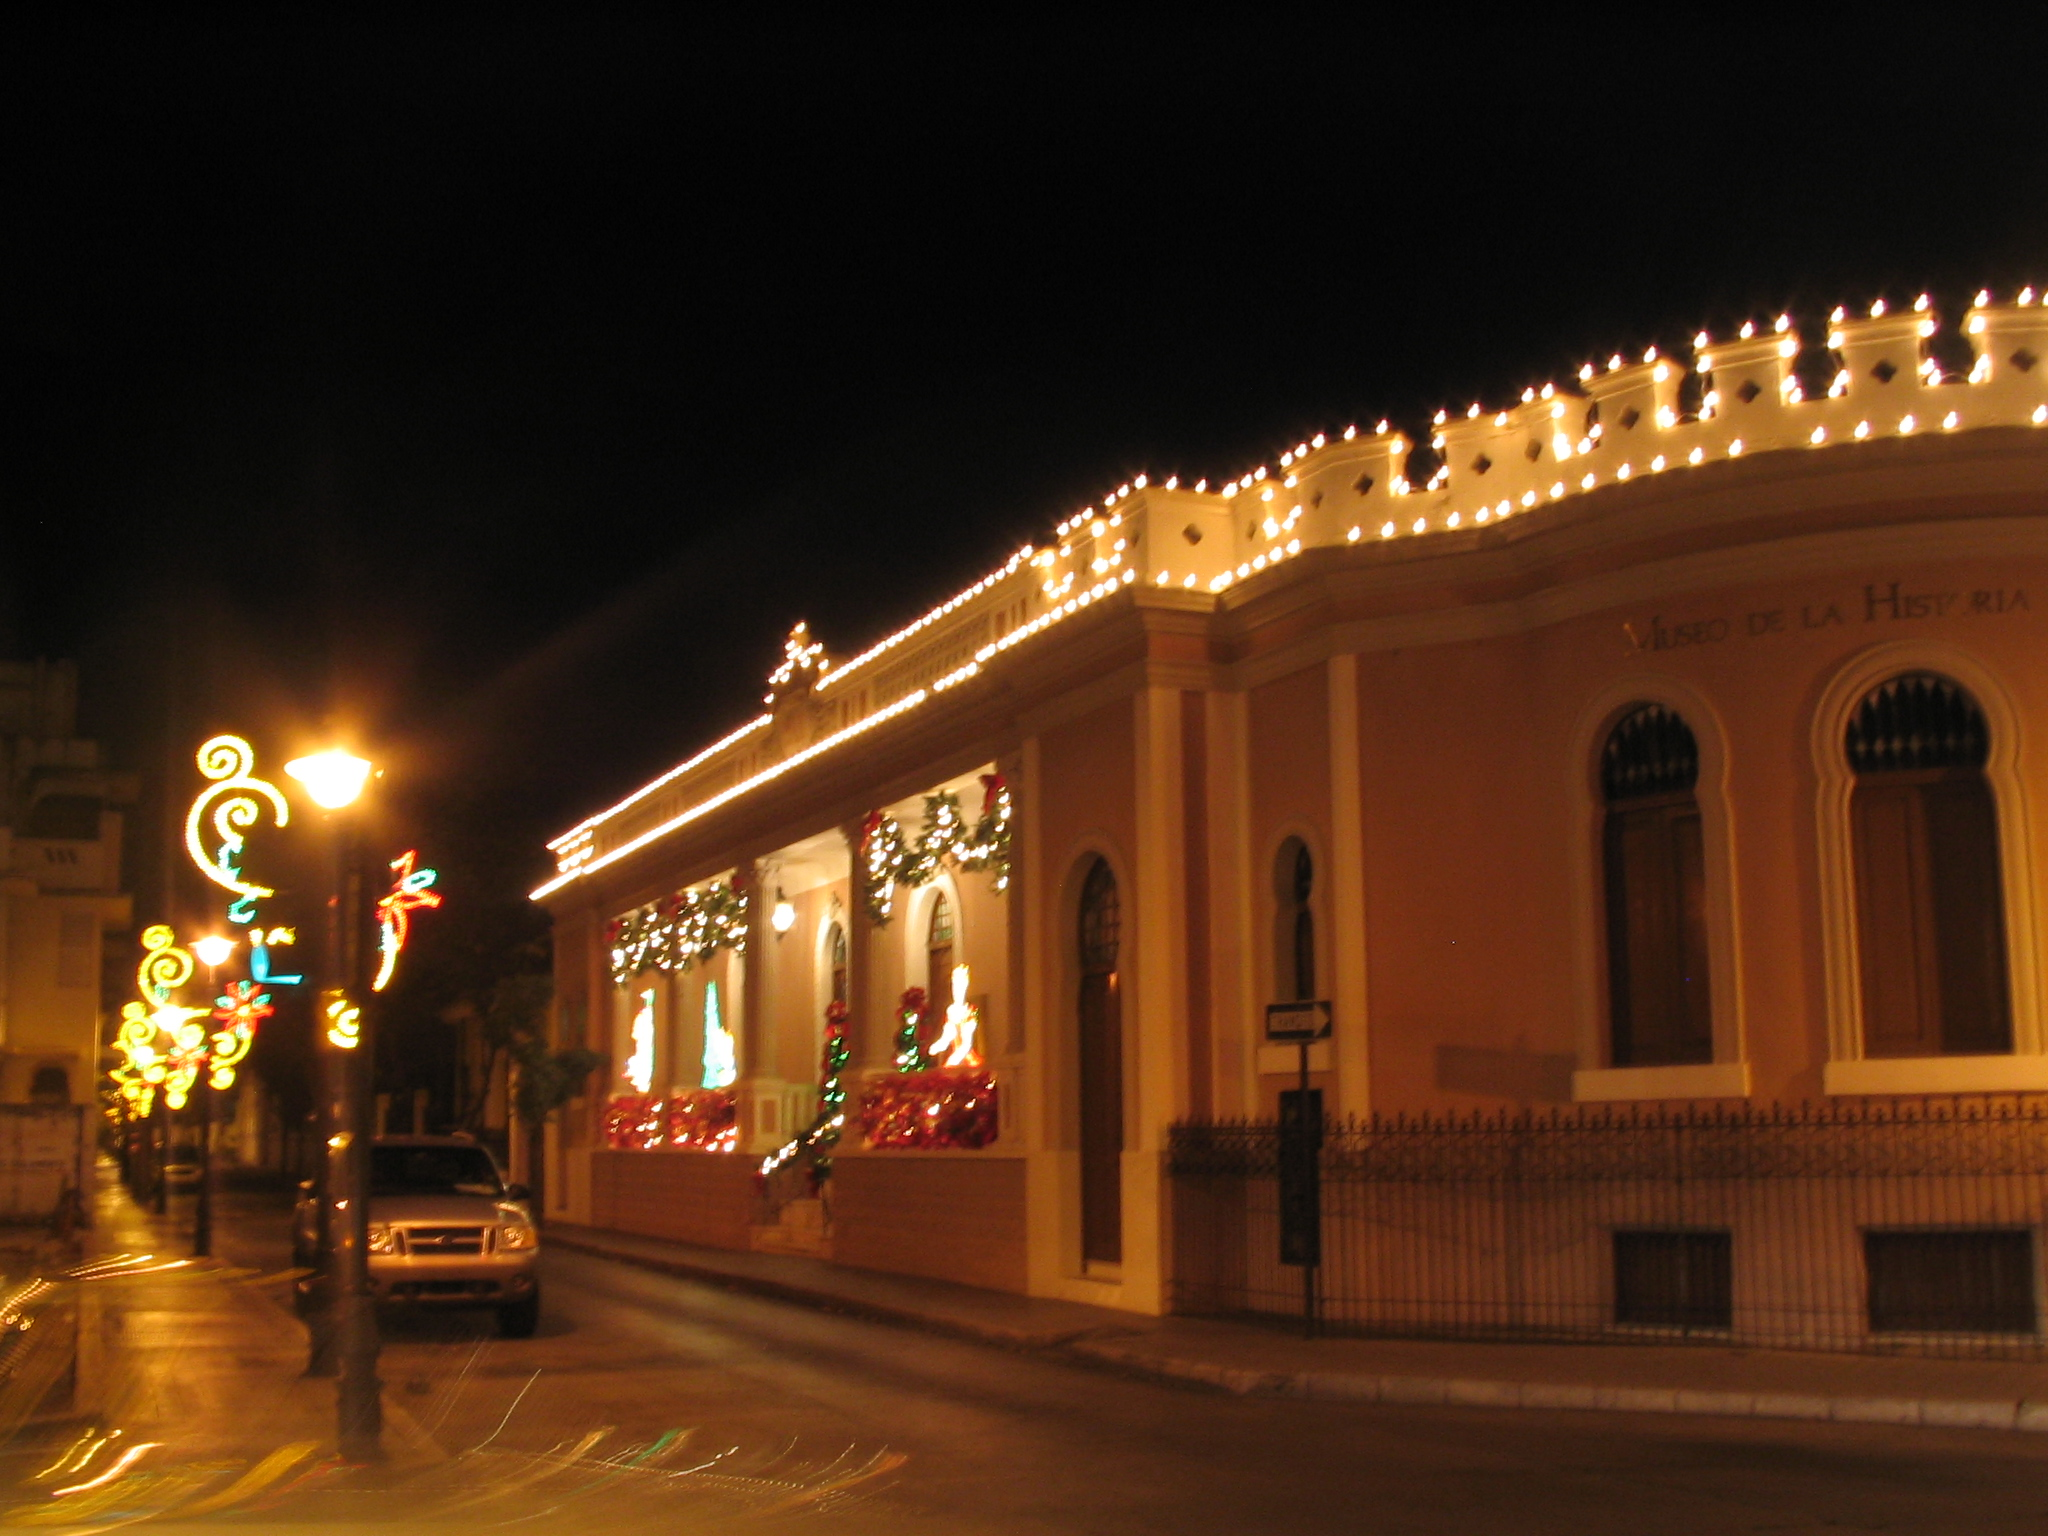 filemuseo de la historia de ponce christmas lights ponce puerto ricojpg - Puerto Rico Christmas